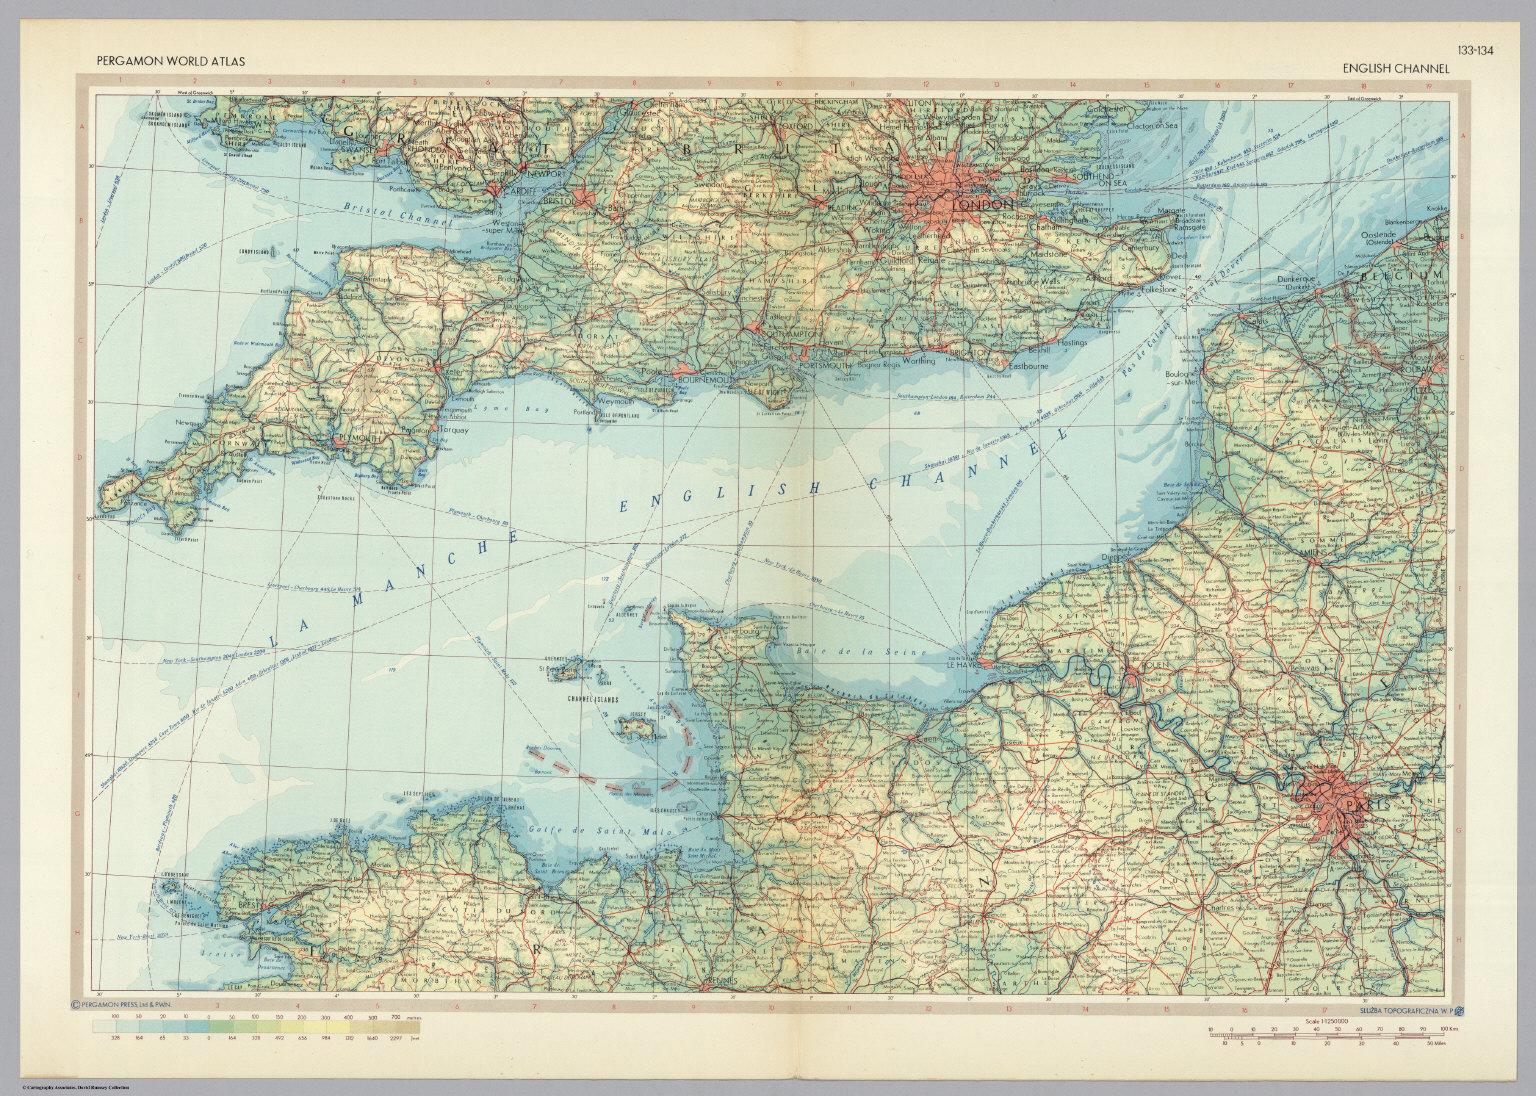 English channel pergamon world atlas david rumsey historical map english channel pergamon world atlas gumiabroncs Choice Image